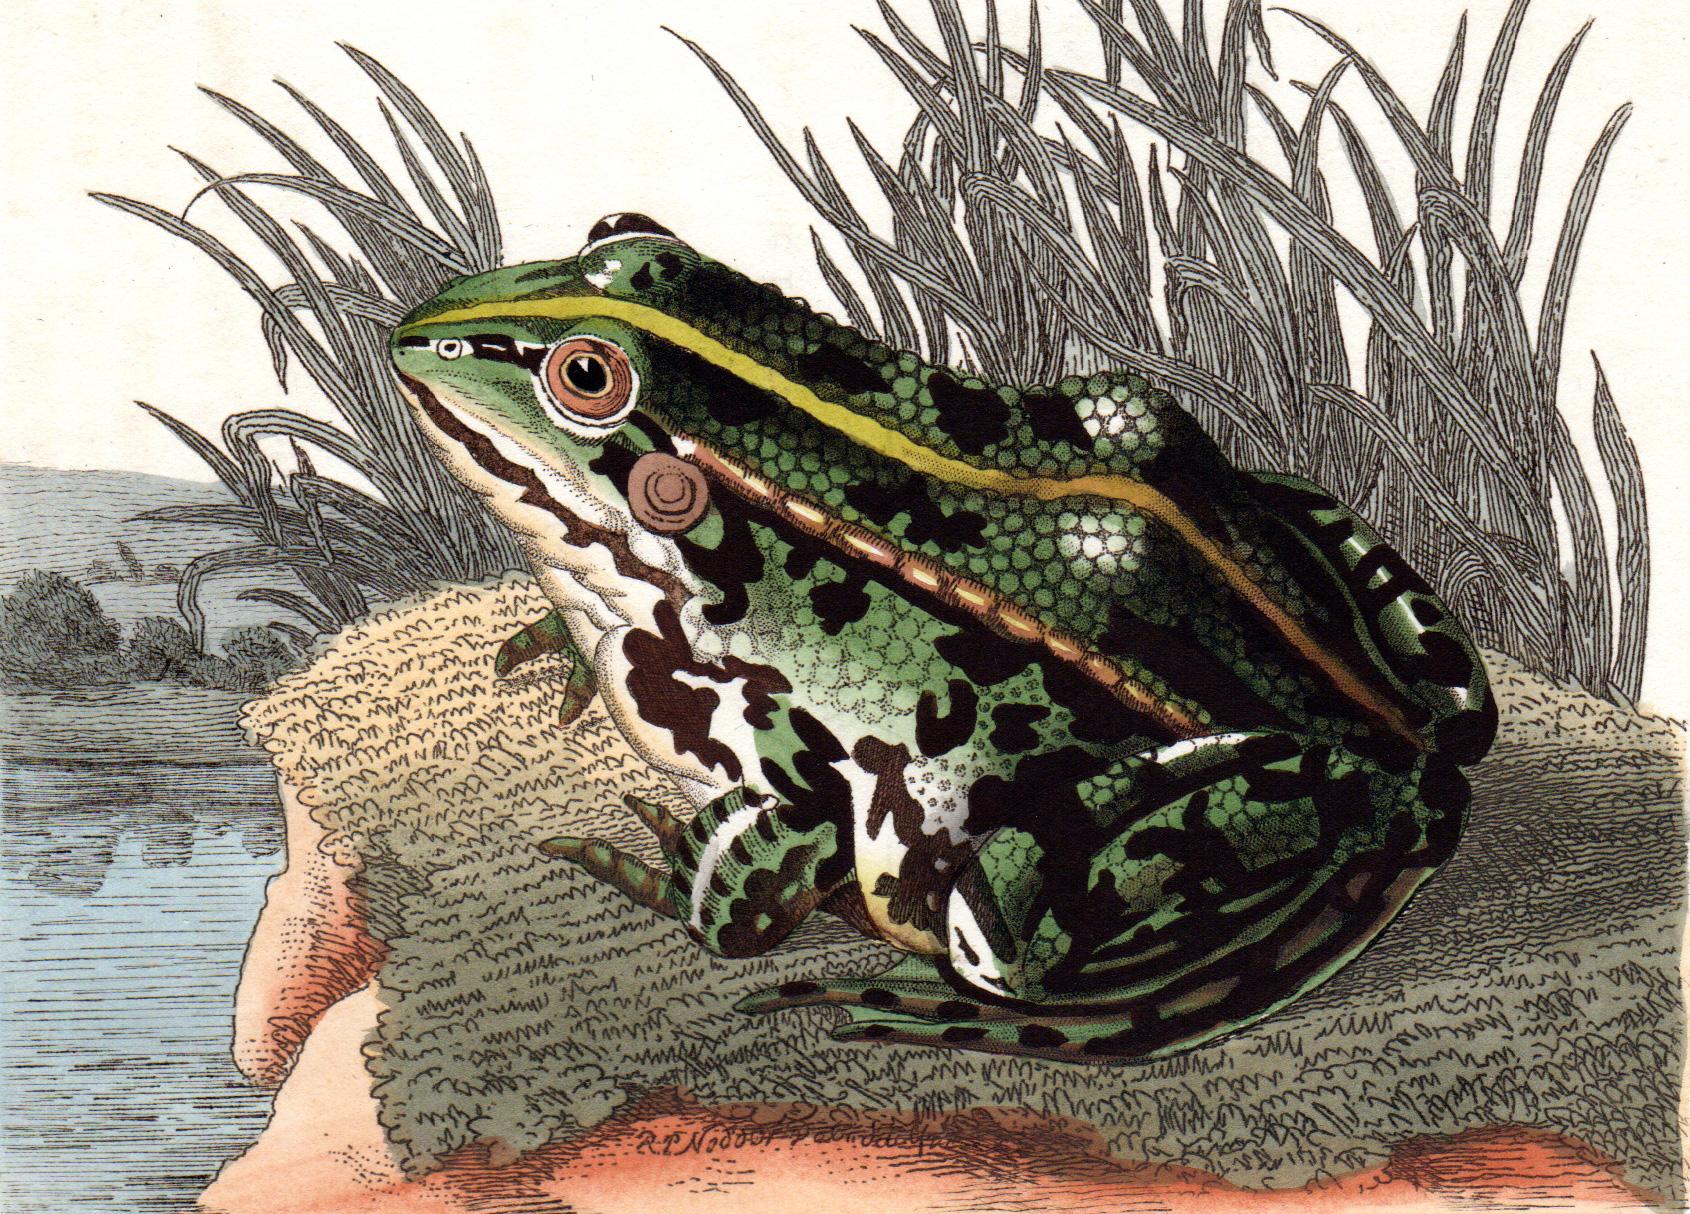 Shaw, George / Nodder, Frederick & Robert P. – Frogs, Turtles, Lizards, etc.